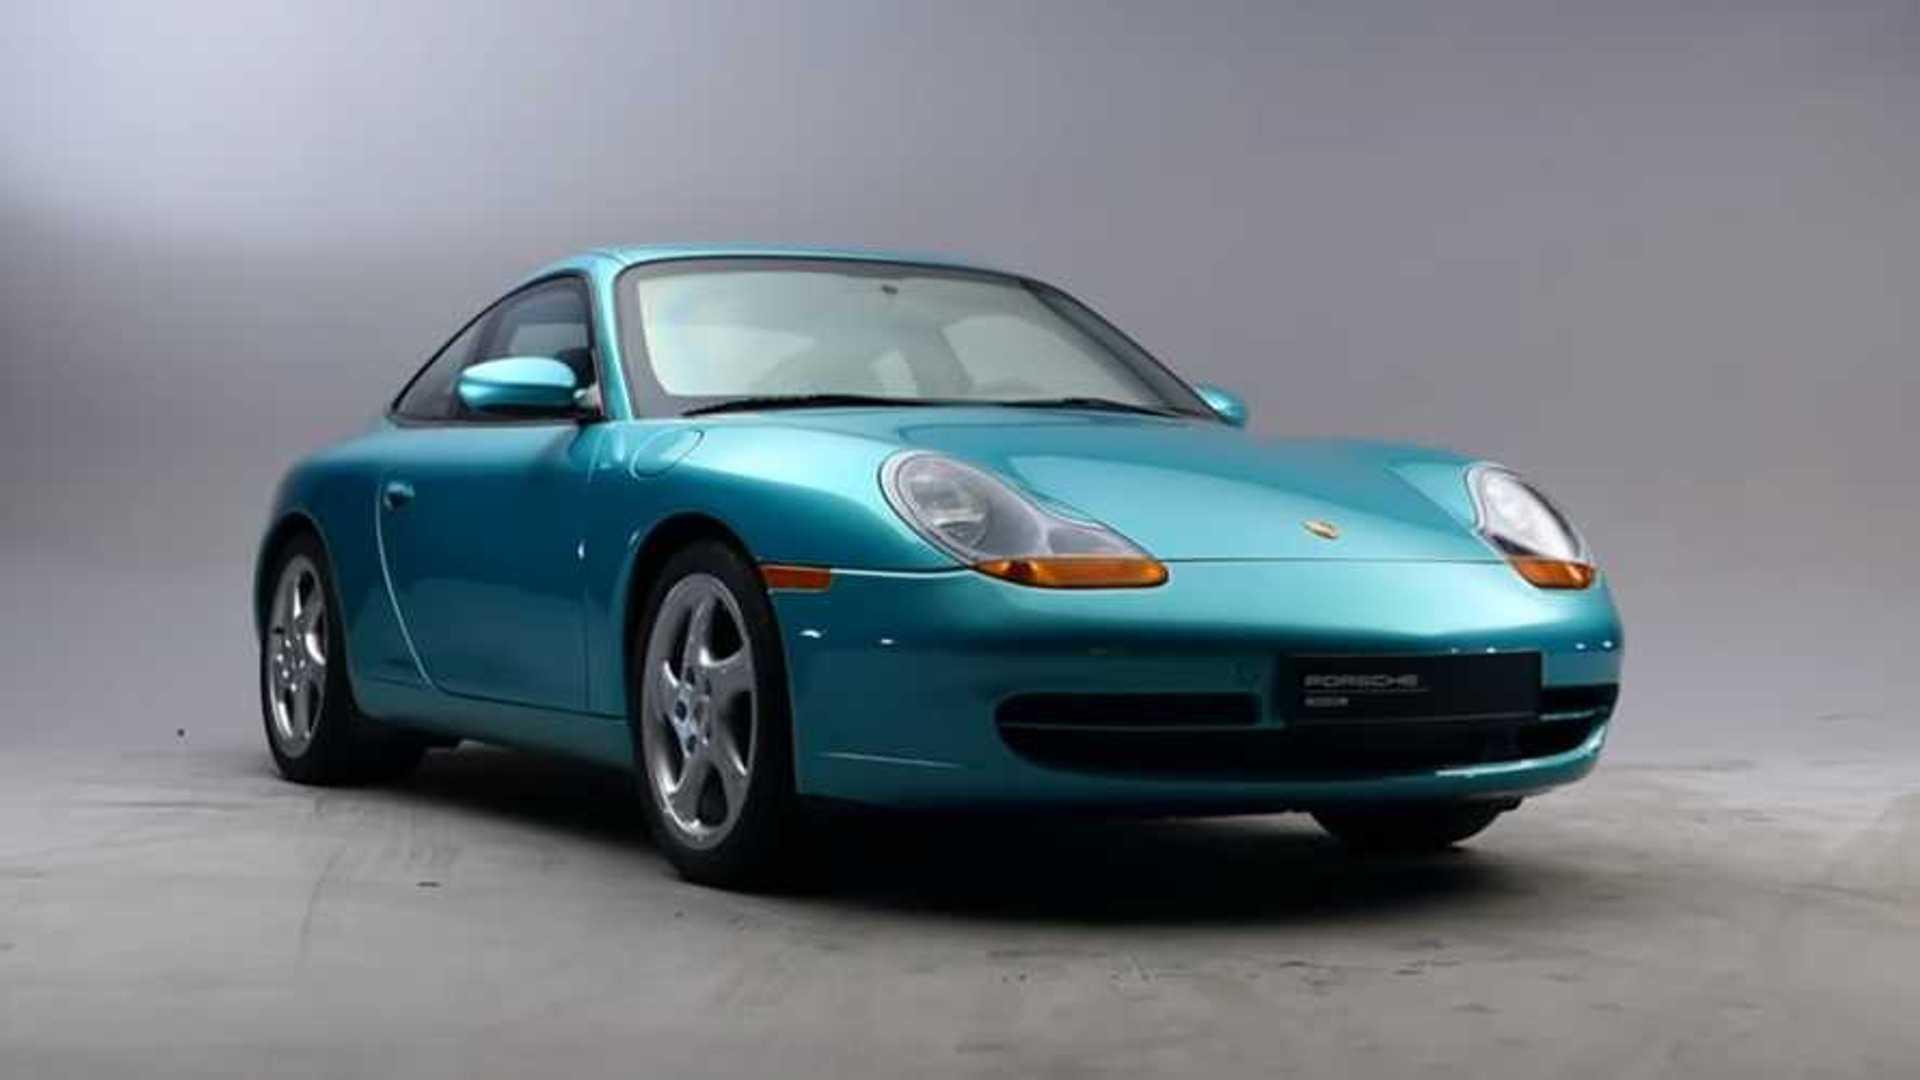 One-Off Bulletproof Porsche 911 Walkaround Video